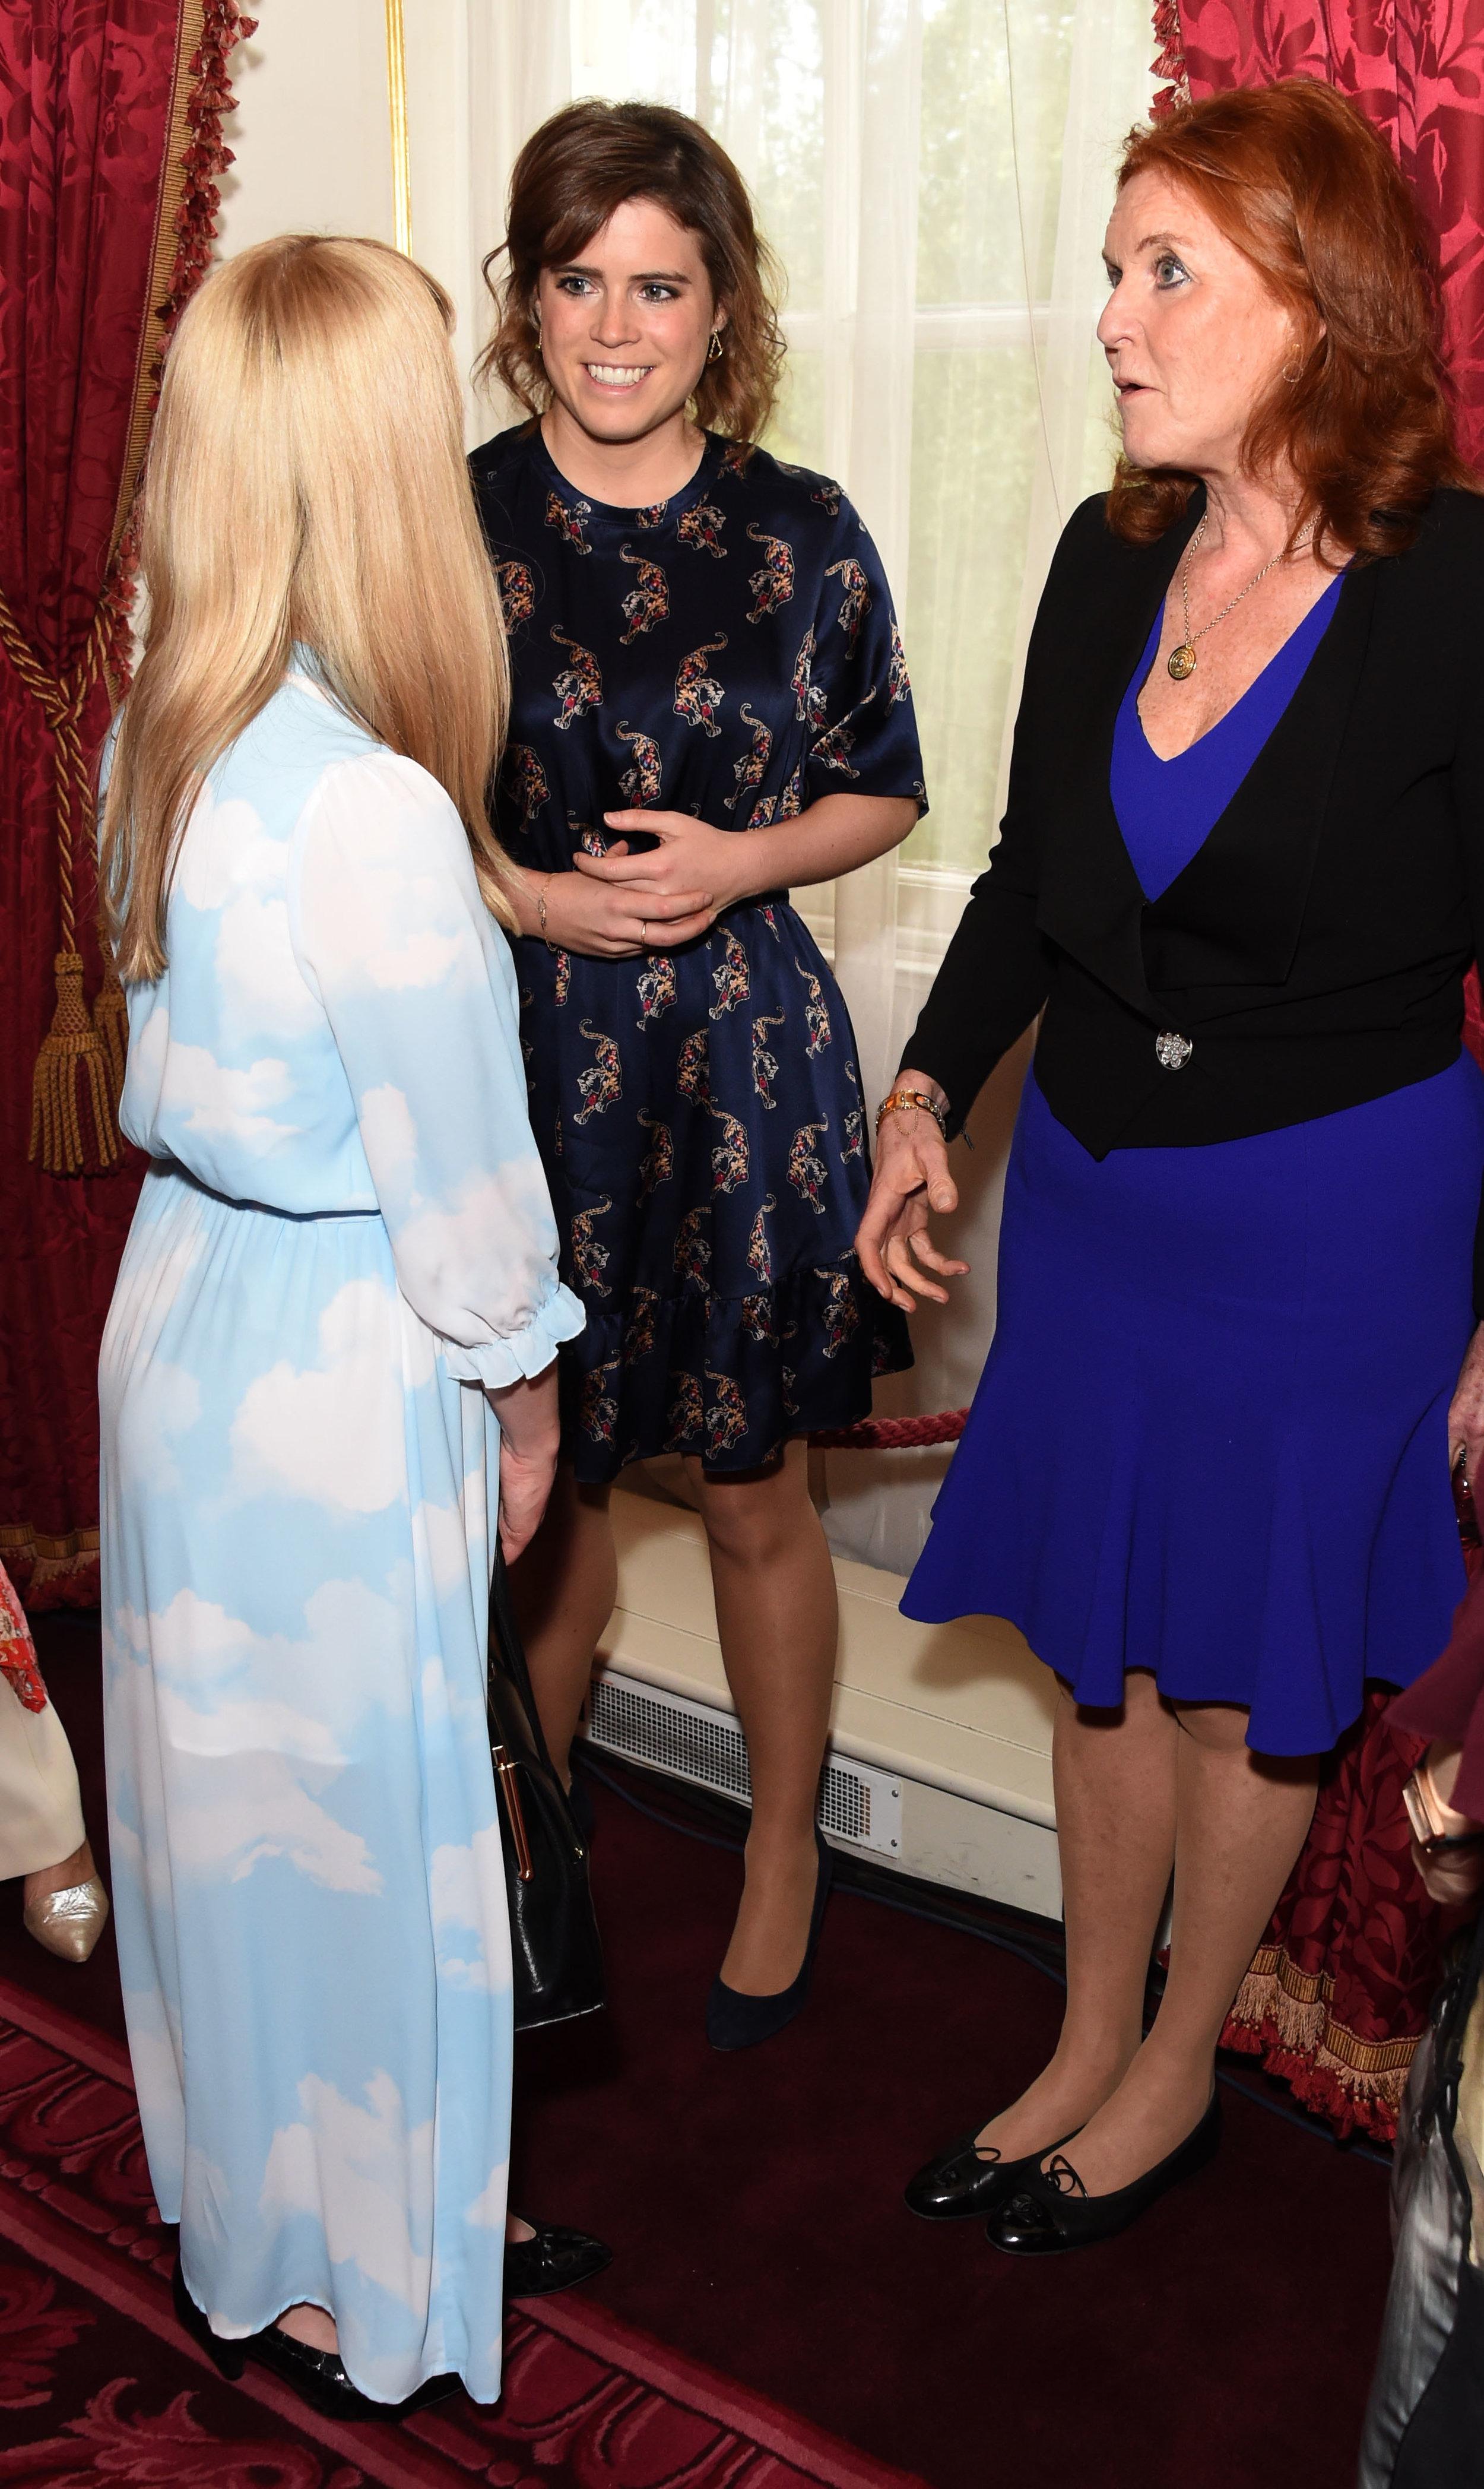 Oscar's Book Prize 2018 winning illustrator Laura Hughes, HRH Princess Eugenie and Sarah, Duchess of York. Image: Dave Benett